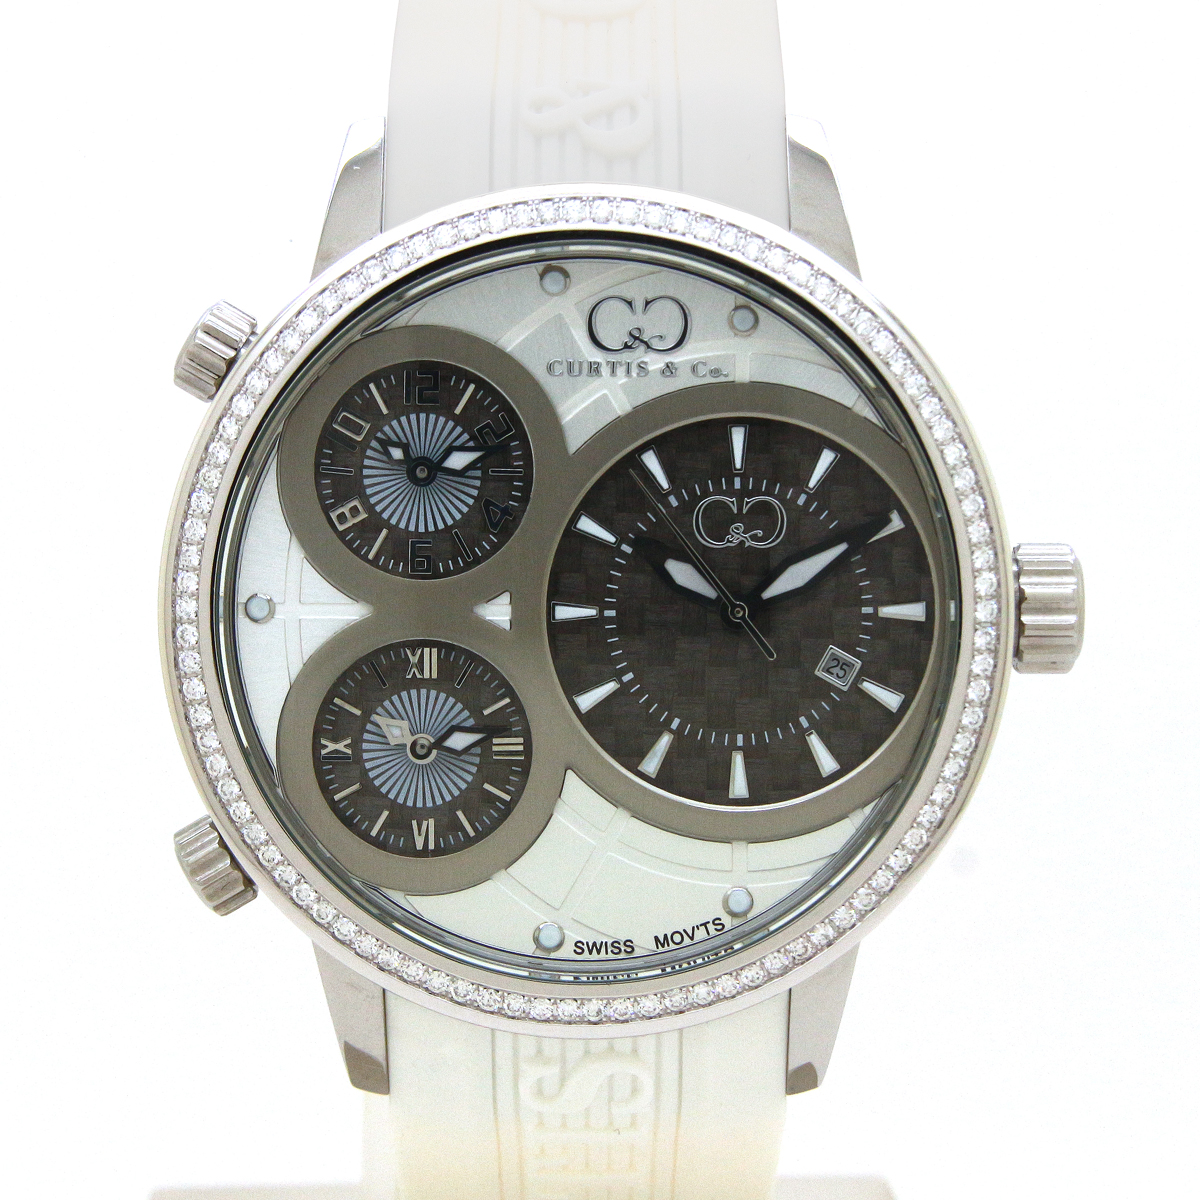 CURTIS&Co(カーティス)BIG TIME WORLD 50mm(White) カーティス ビックタイムワールド50mm ダイヤモンド【腕時計】